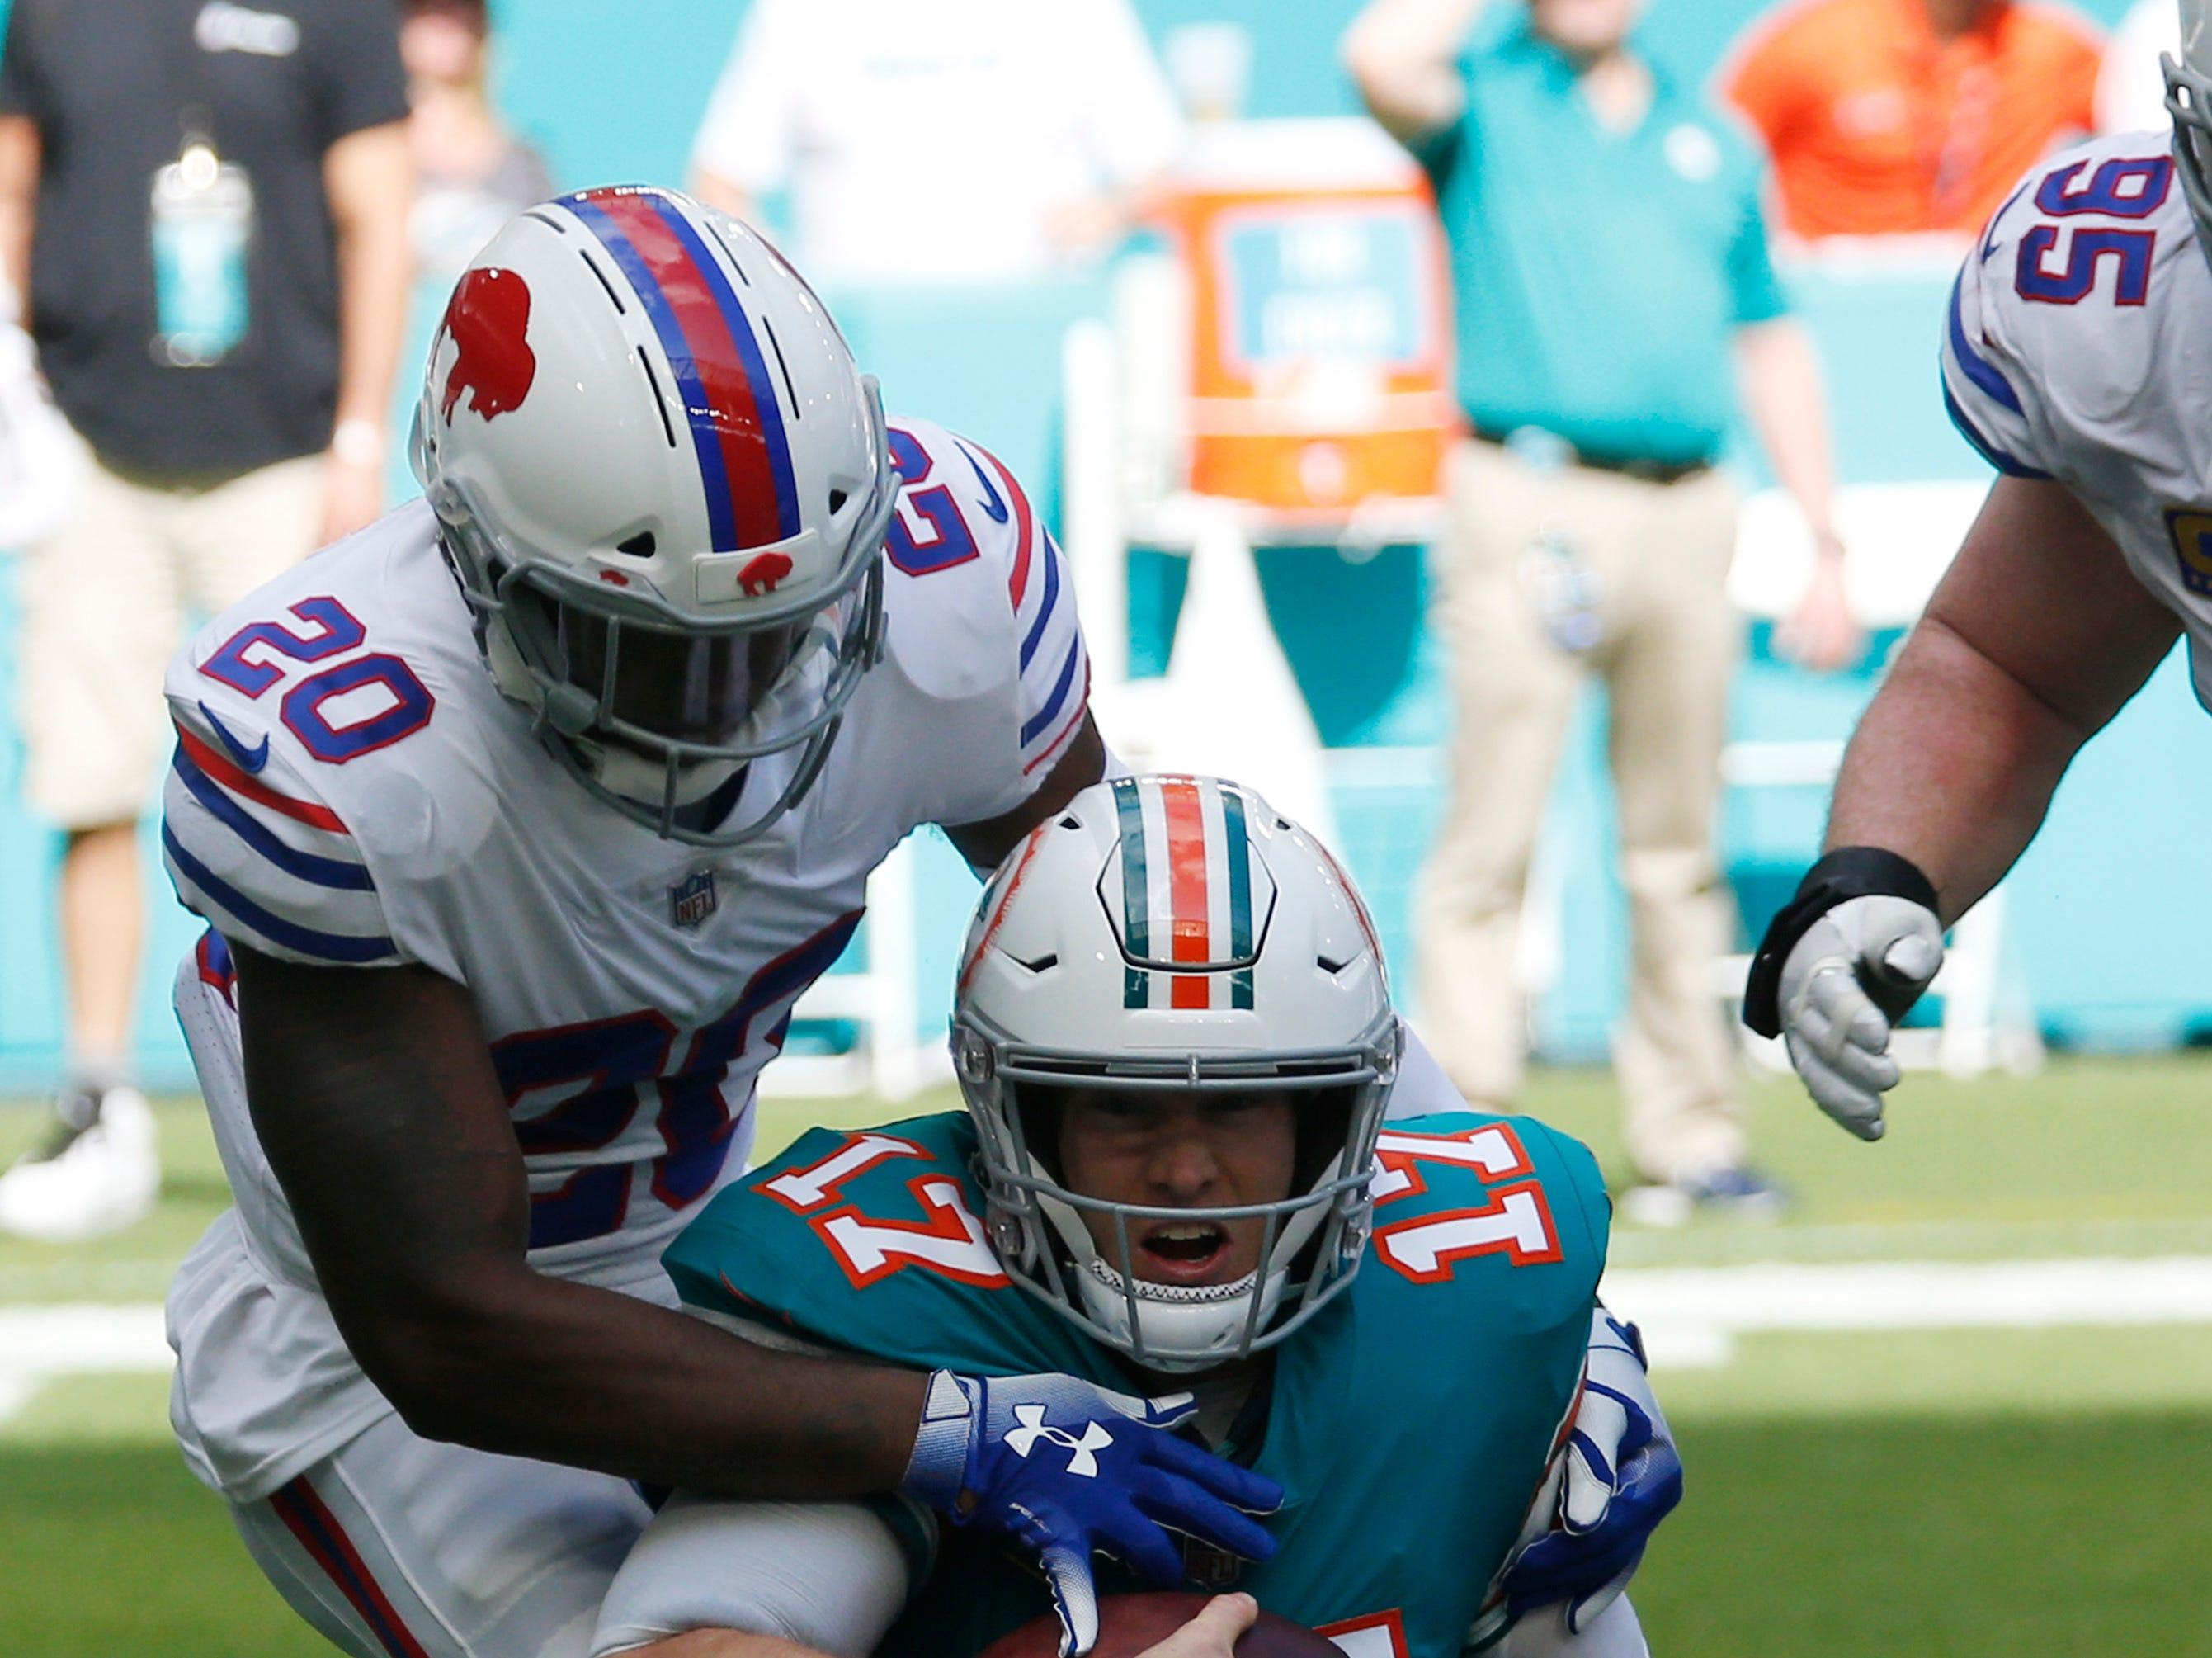 Miami Dolphins quarterback Ryan Tannehill (17) is sacked by Buffalo Bills defensive back Rafael Bush (20), during the first half of an NFL football game, Sunday, Dec. 2, 2018, in Miami Gardens, Fla. (AP Photo/Joel Auerbach)